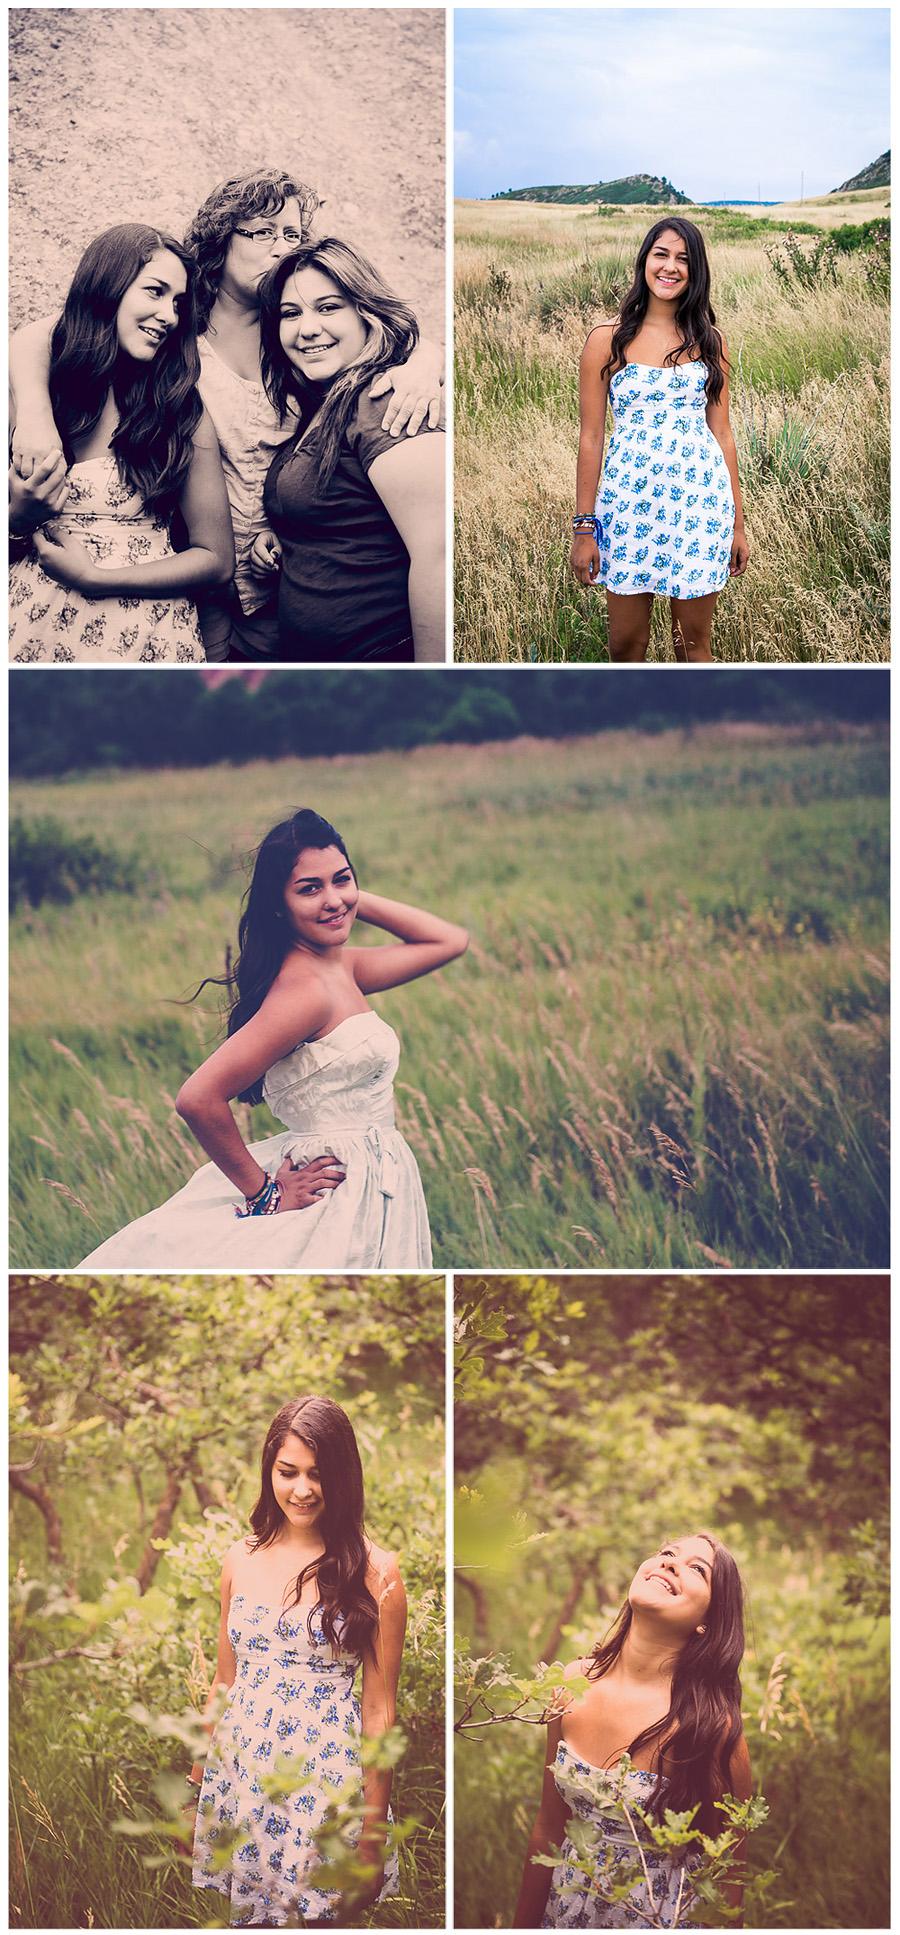 East High School Senior Pictures Jasmine Collage 4